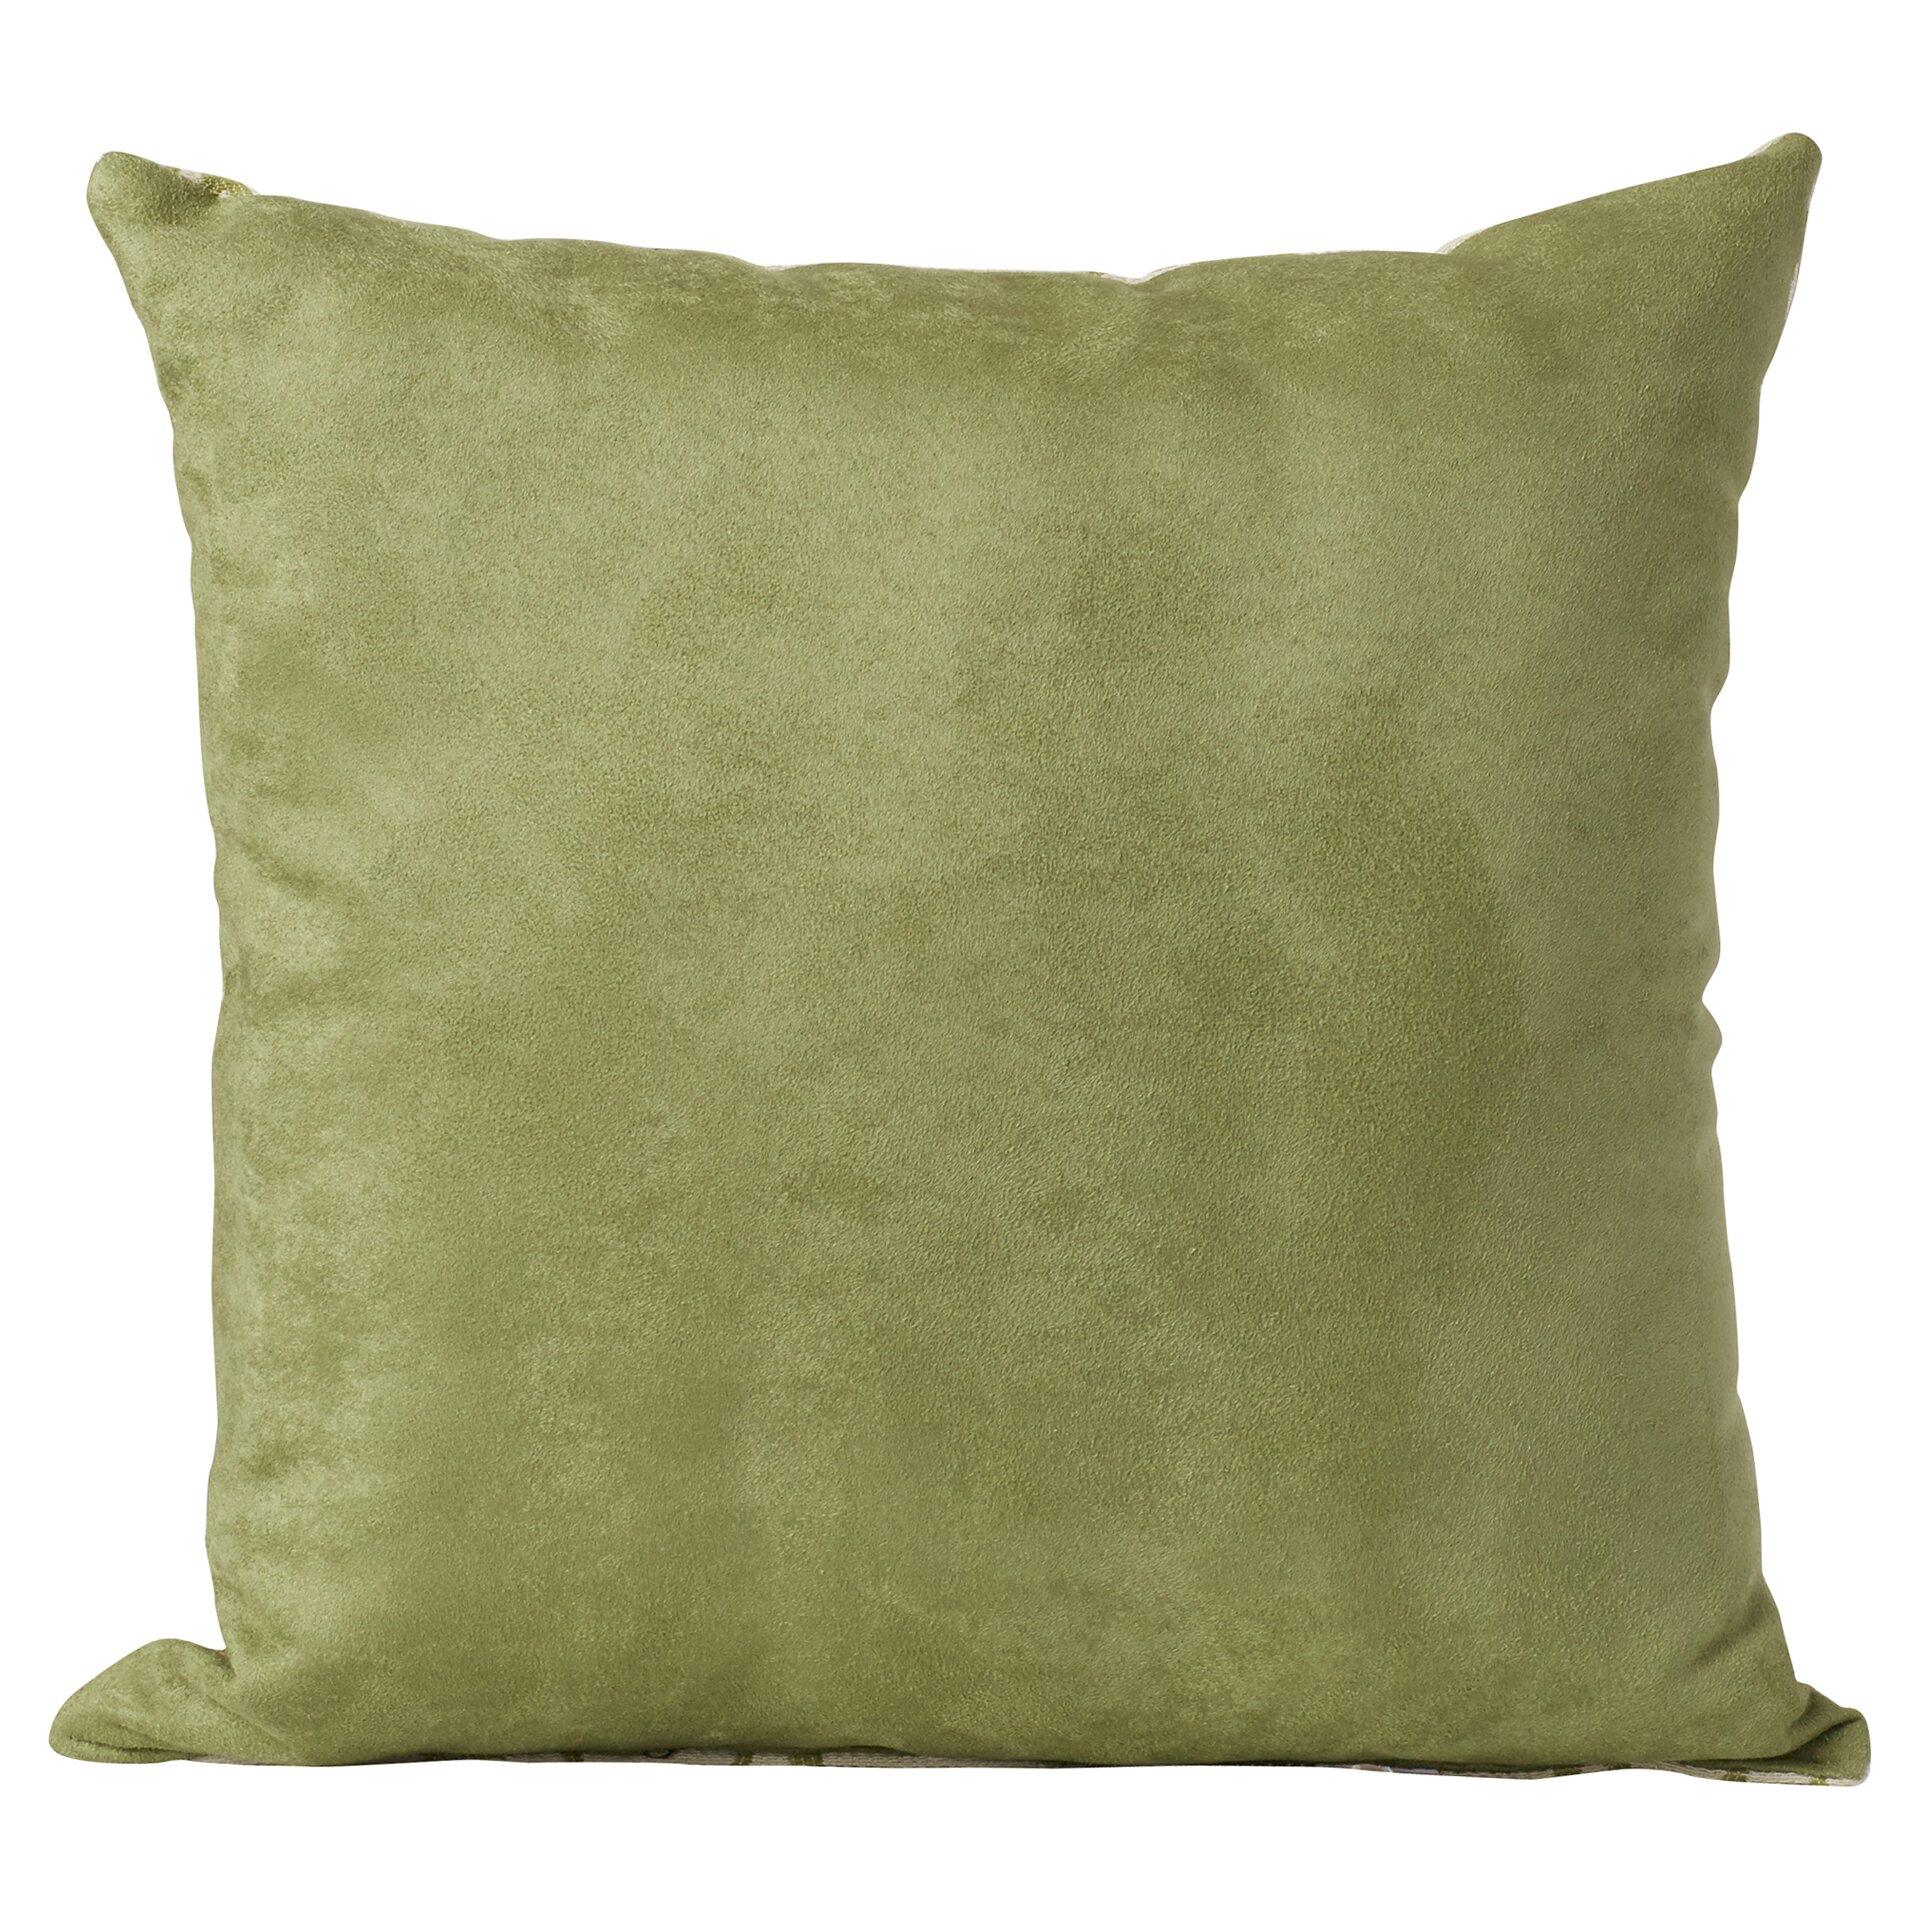 Darby Home Co Milsent Knife Edge Cotton Throw Pillow & Reviews Wayfair